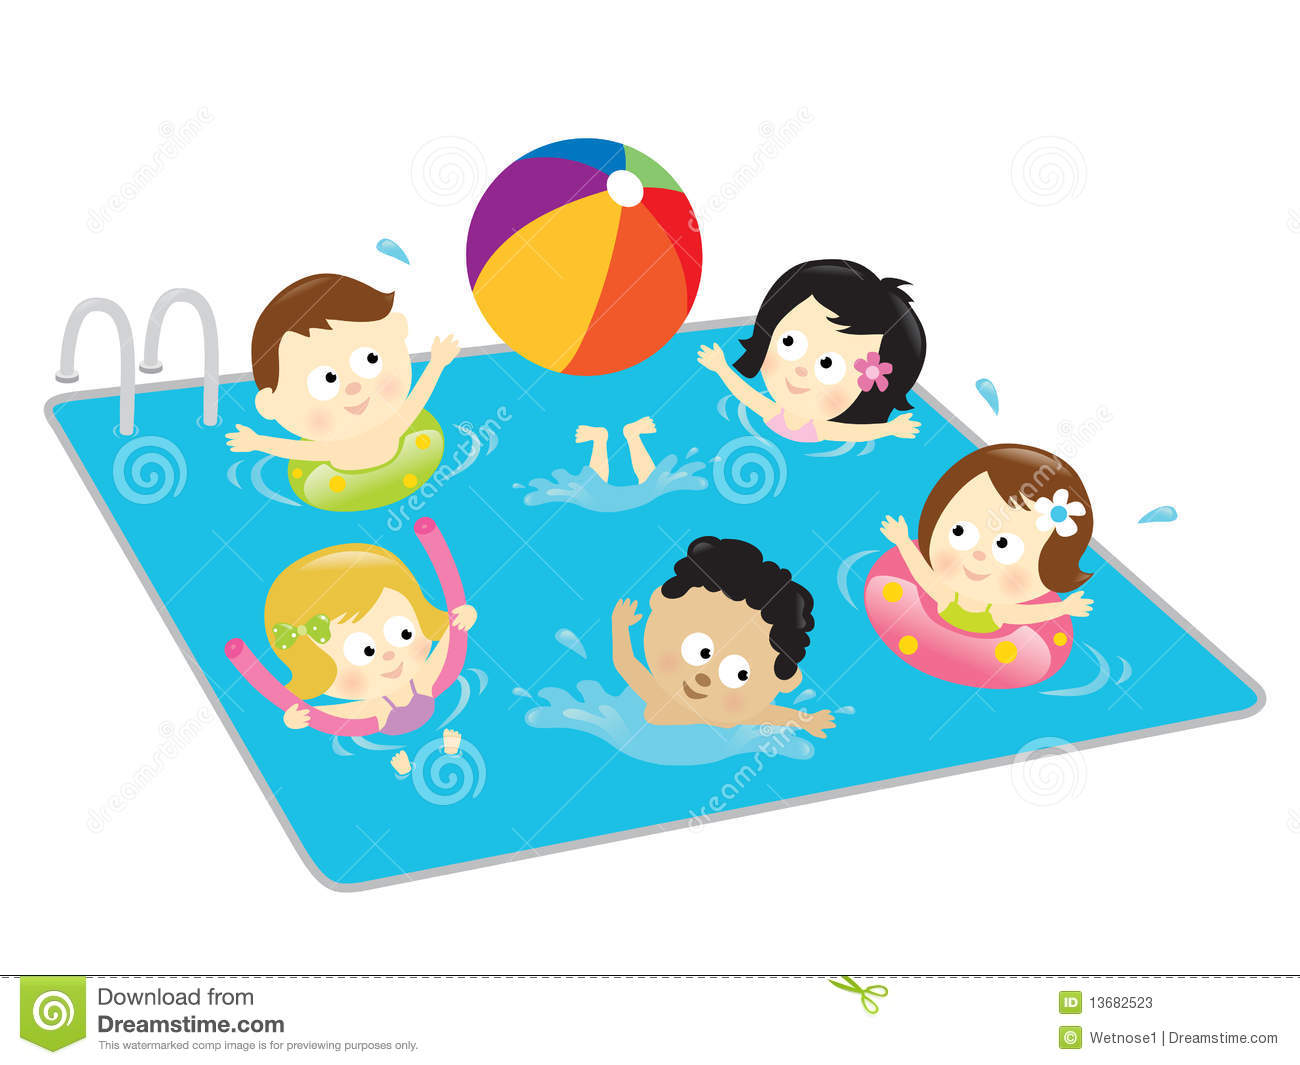 Free swimming pool clipart svg transparent Baby Swimming Pool Clipart #1 | Clipart Panda - Free Clipart Images svg transparent